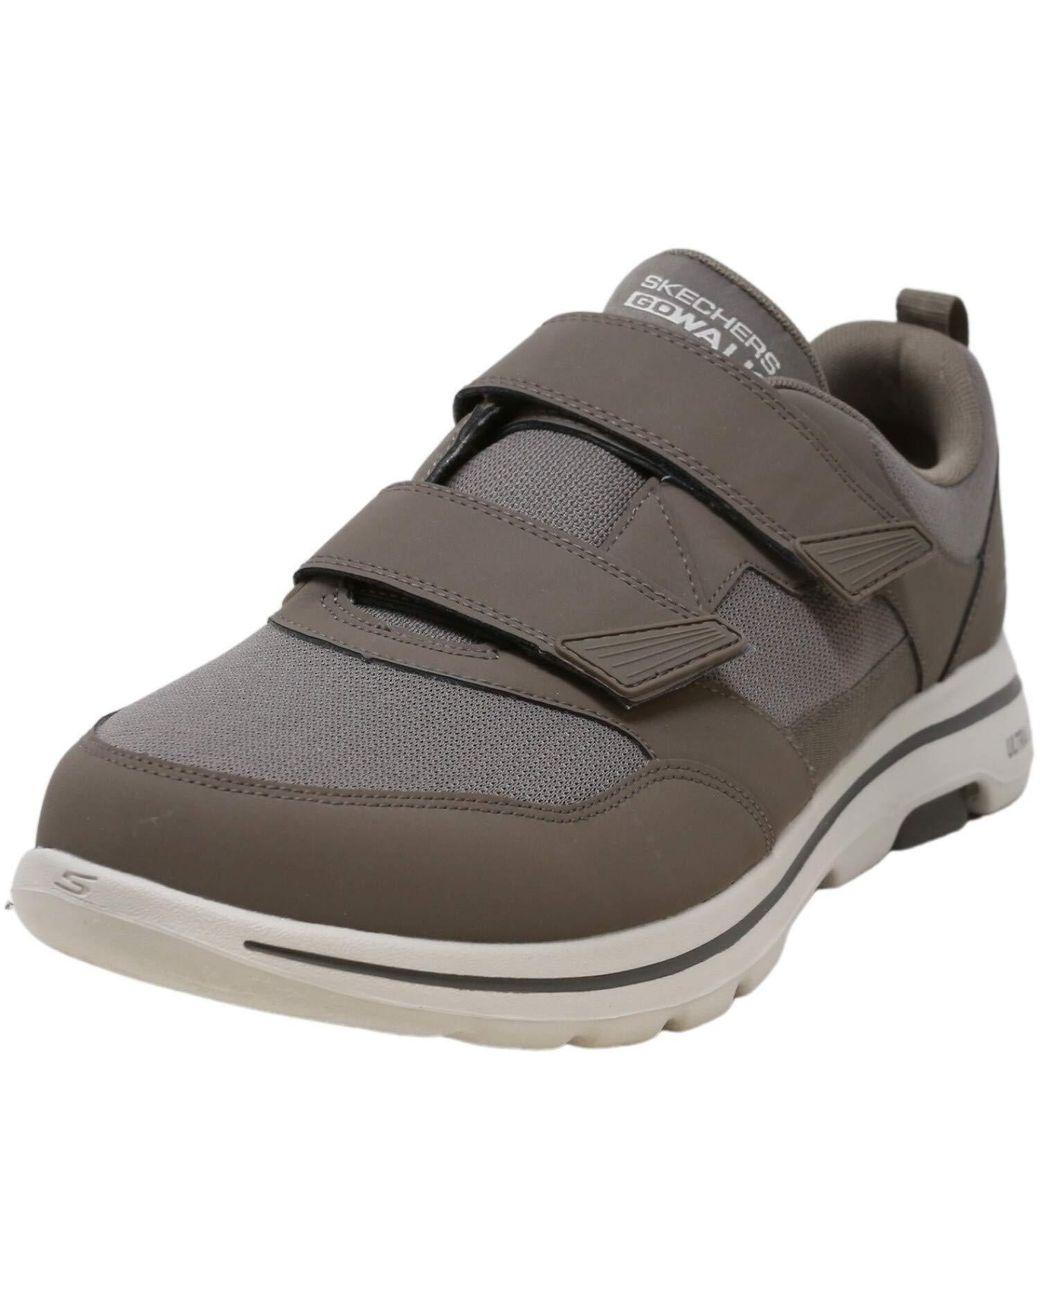 Skechers Double Velcro Athletic Mesh